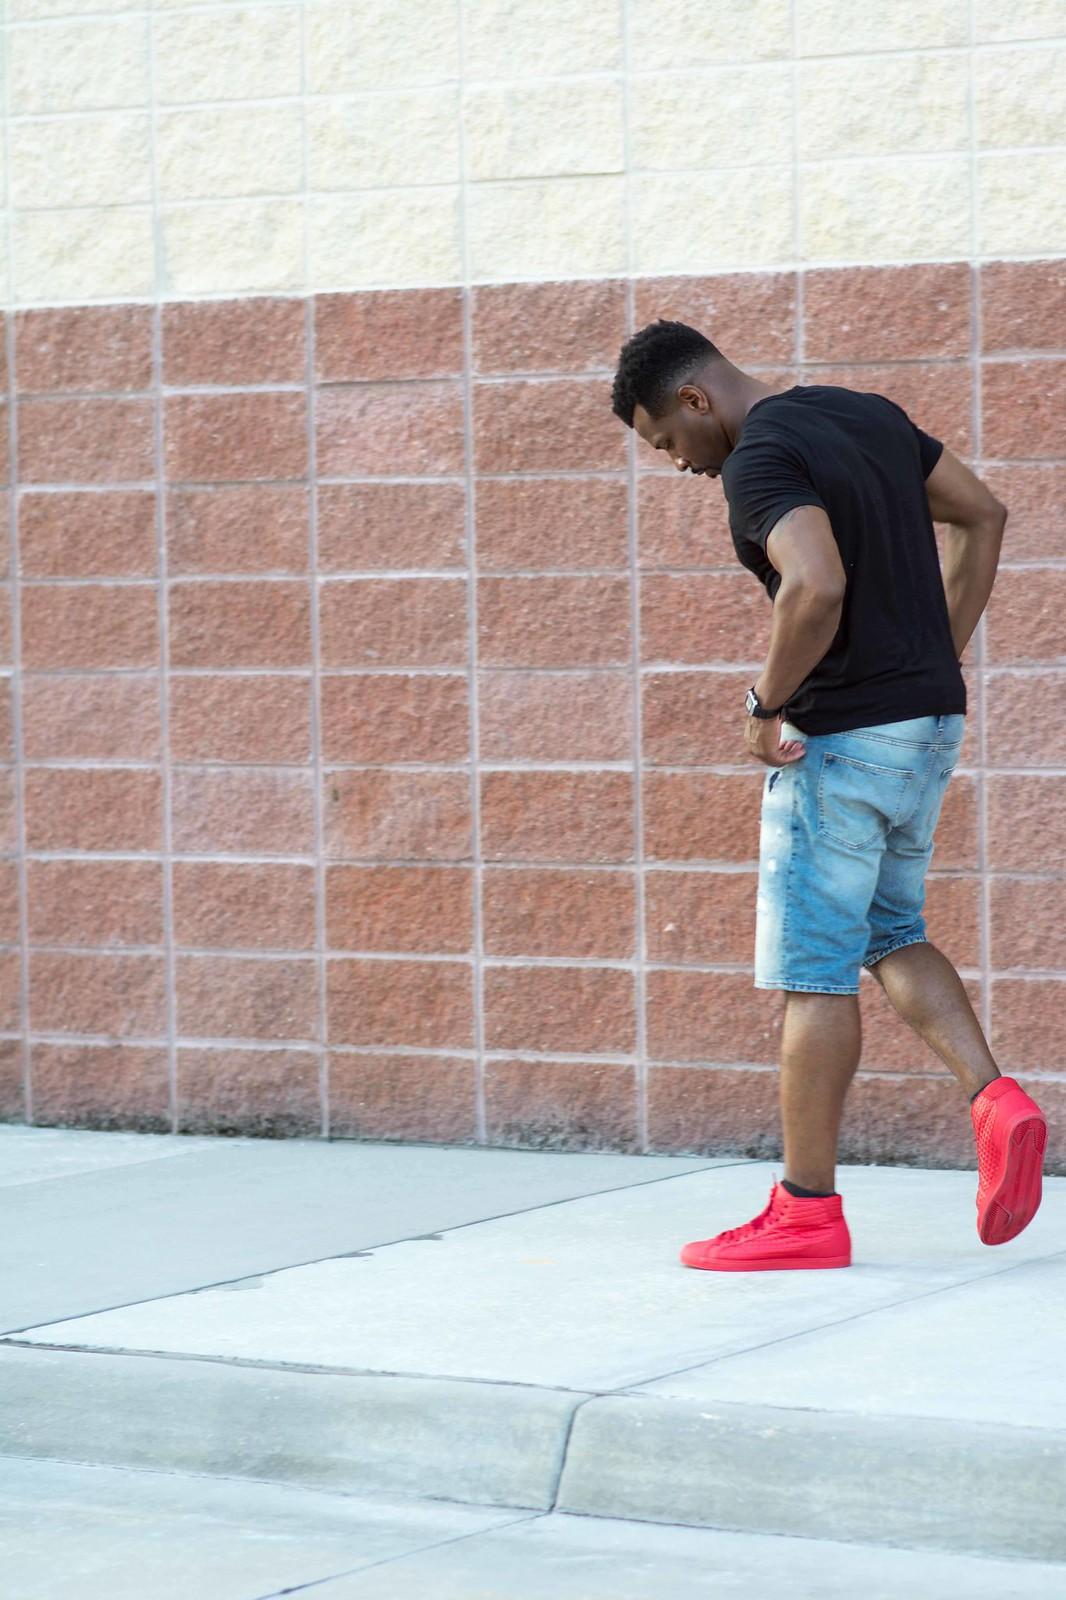 how to wear red shoes, keshaun fudge